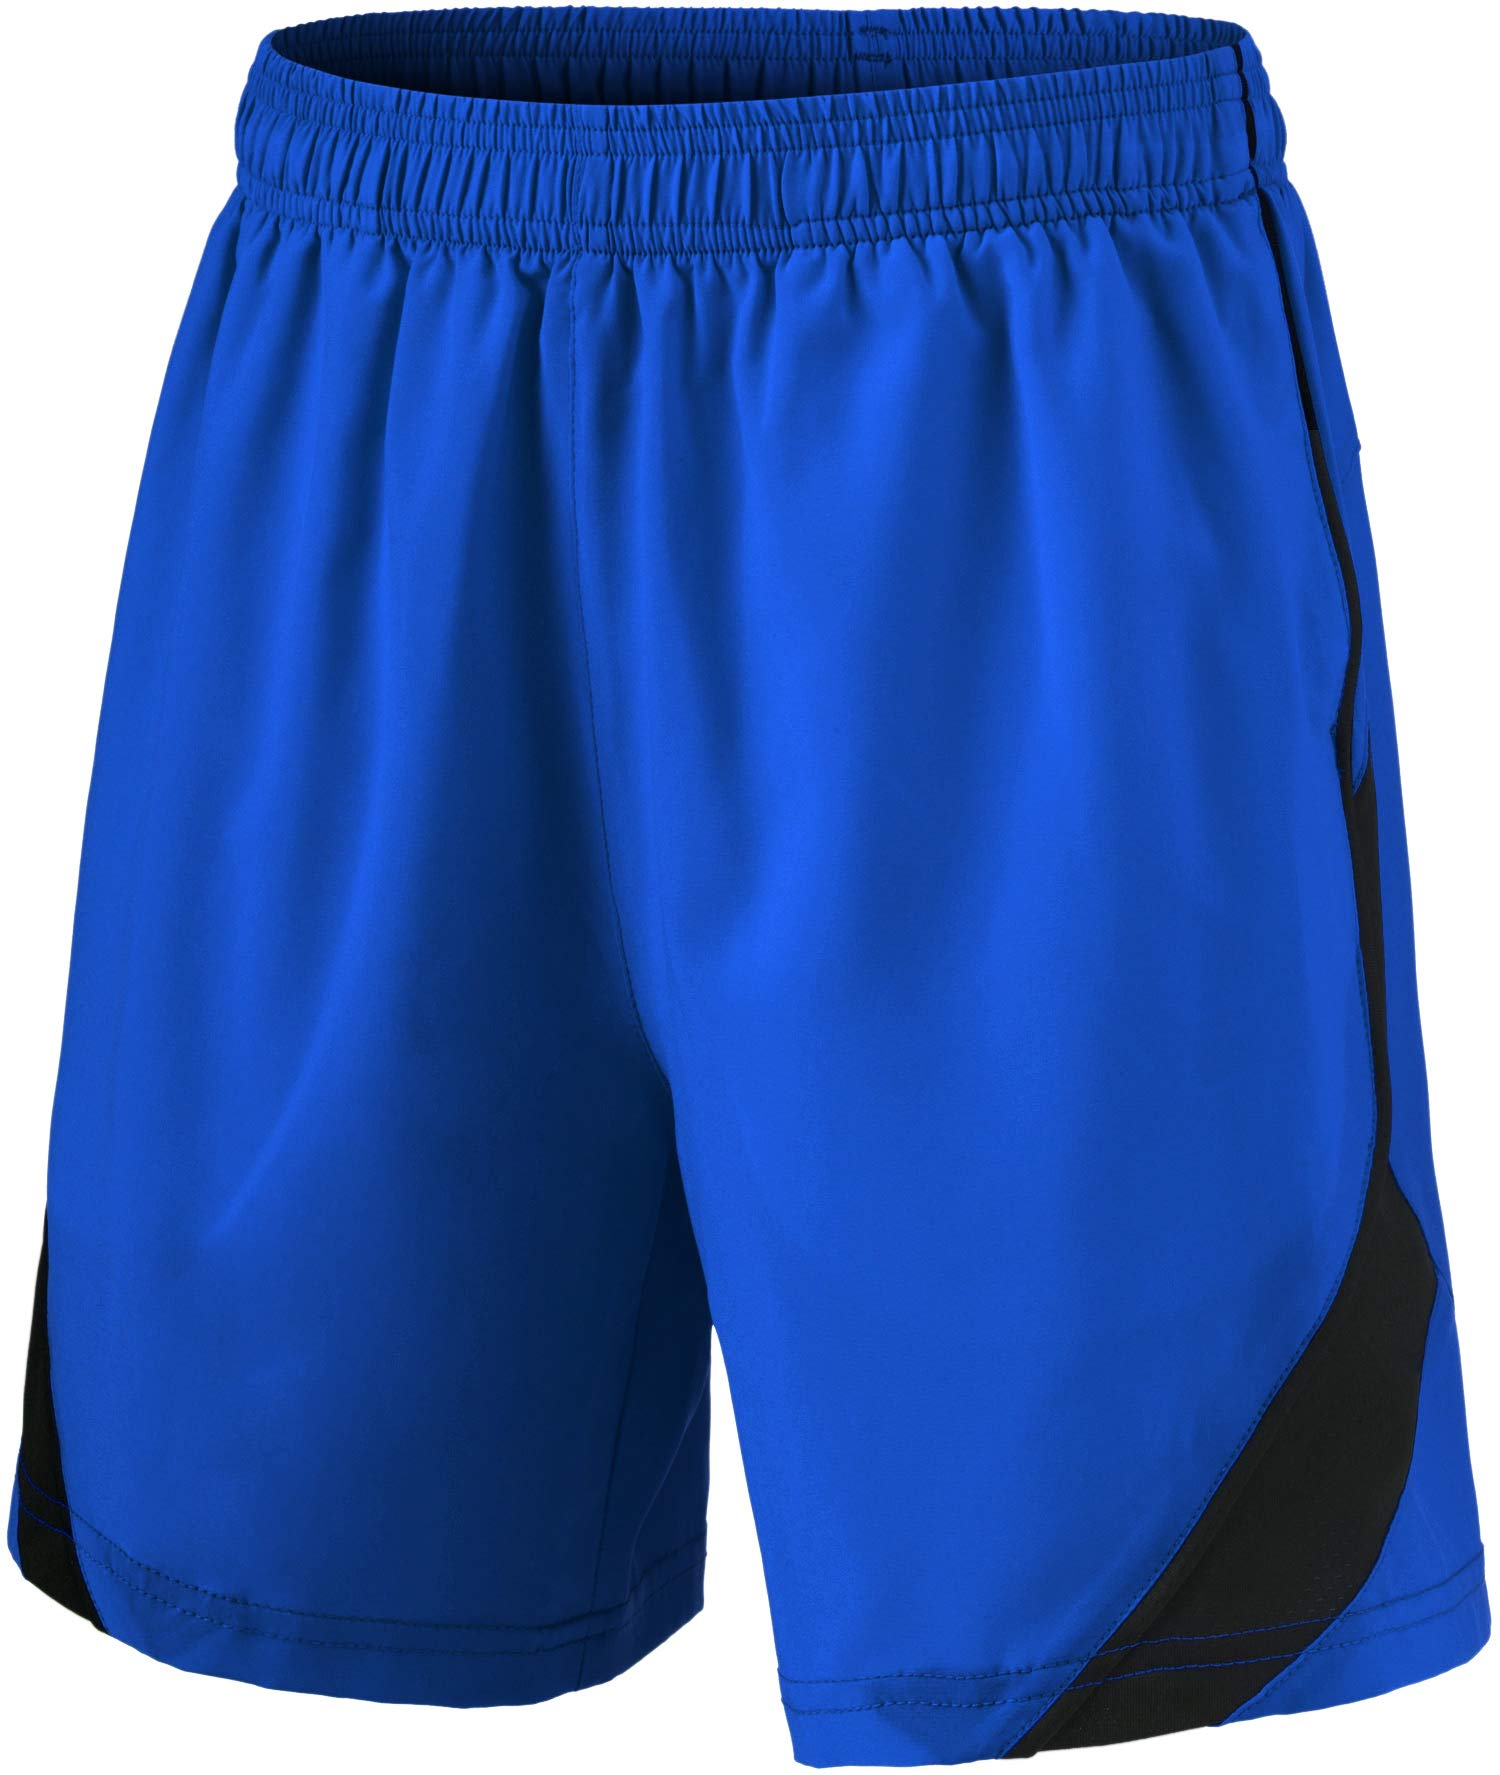 TSLA Boy's Active Shorts Sports Performance Youth HyperDri II w Pockets, Stretch Pace(kbh76) - Blue, Youth X-Large by TSLA